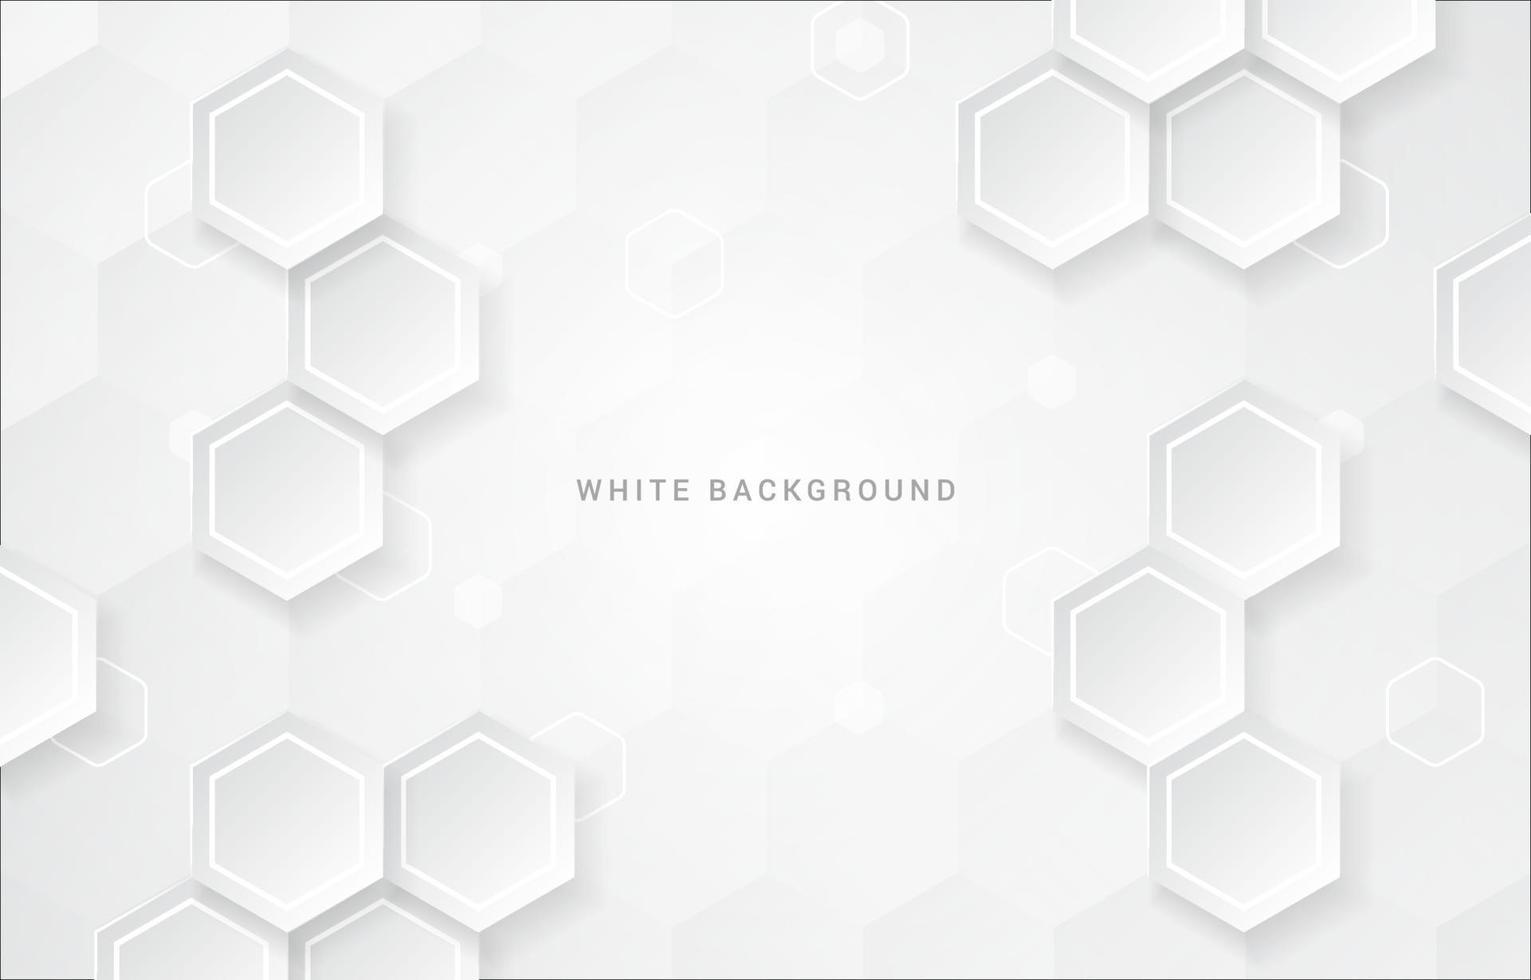 Hexagonal Geomtric White Background vector